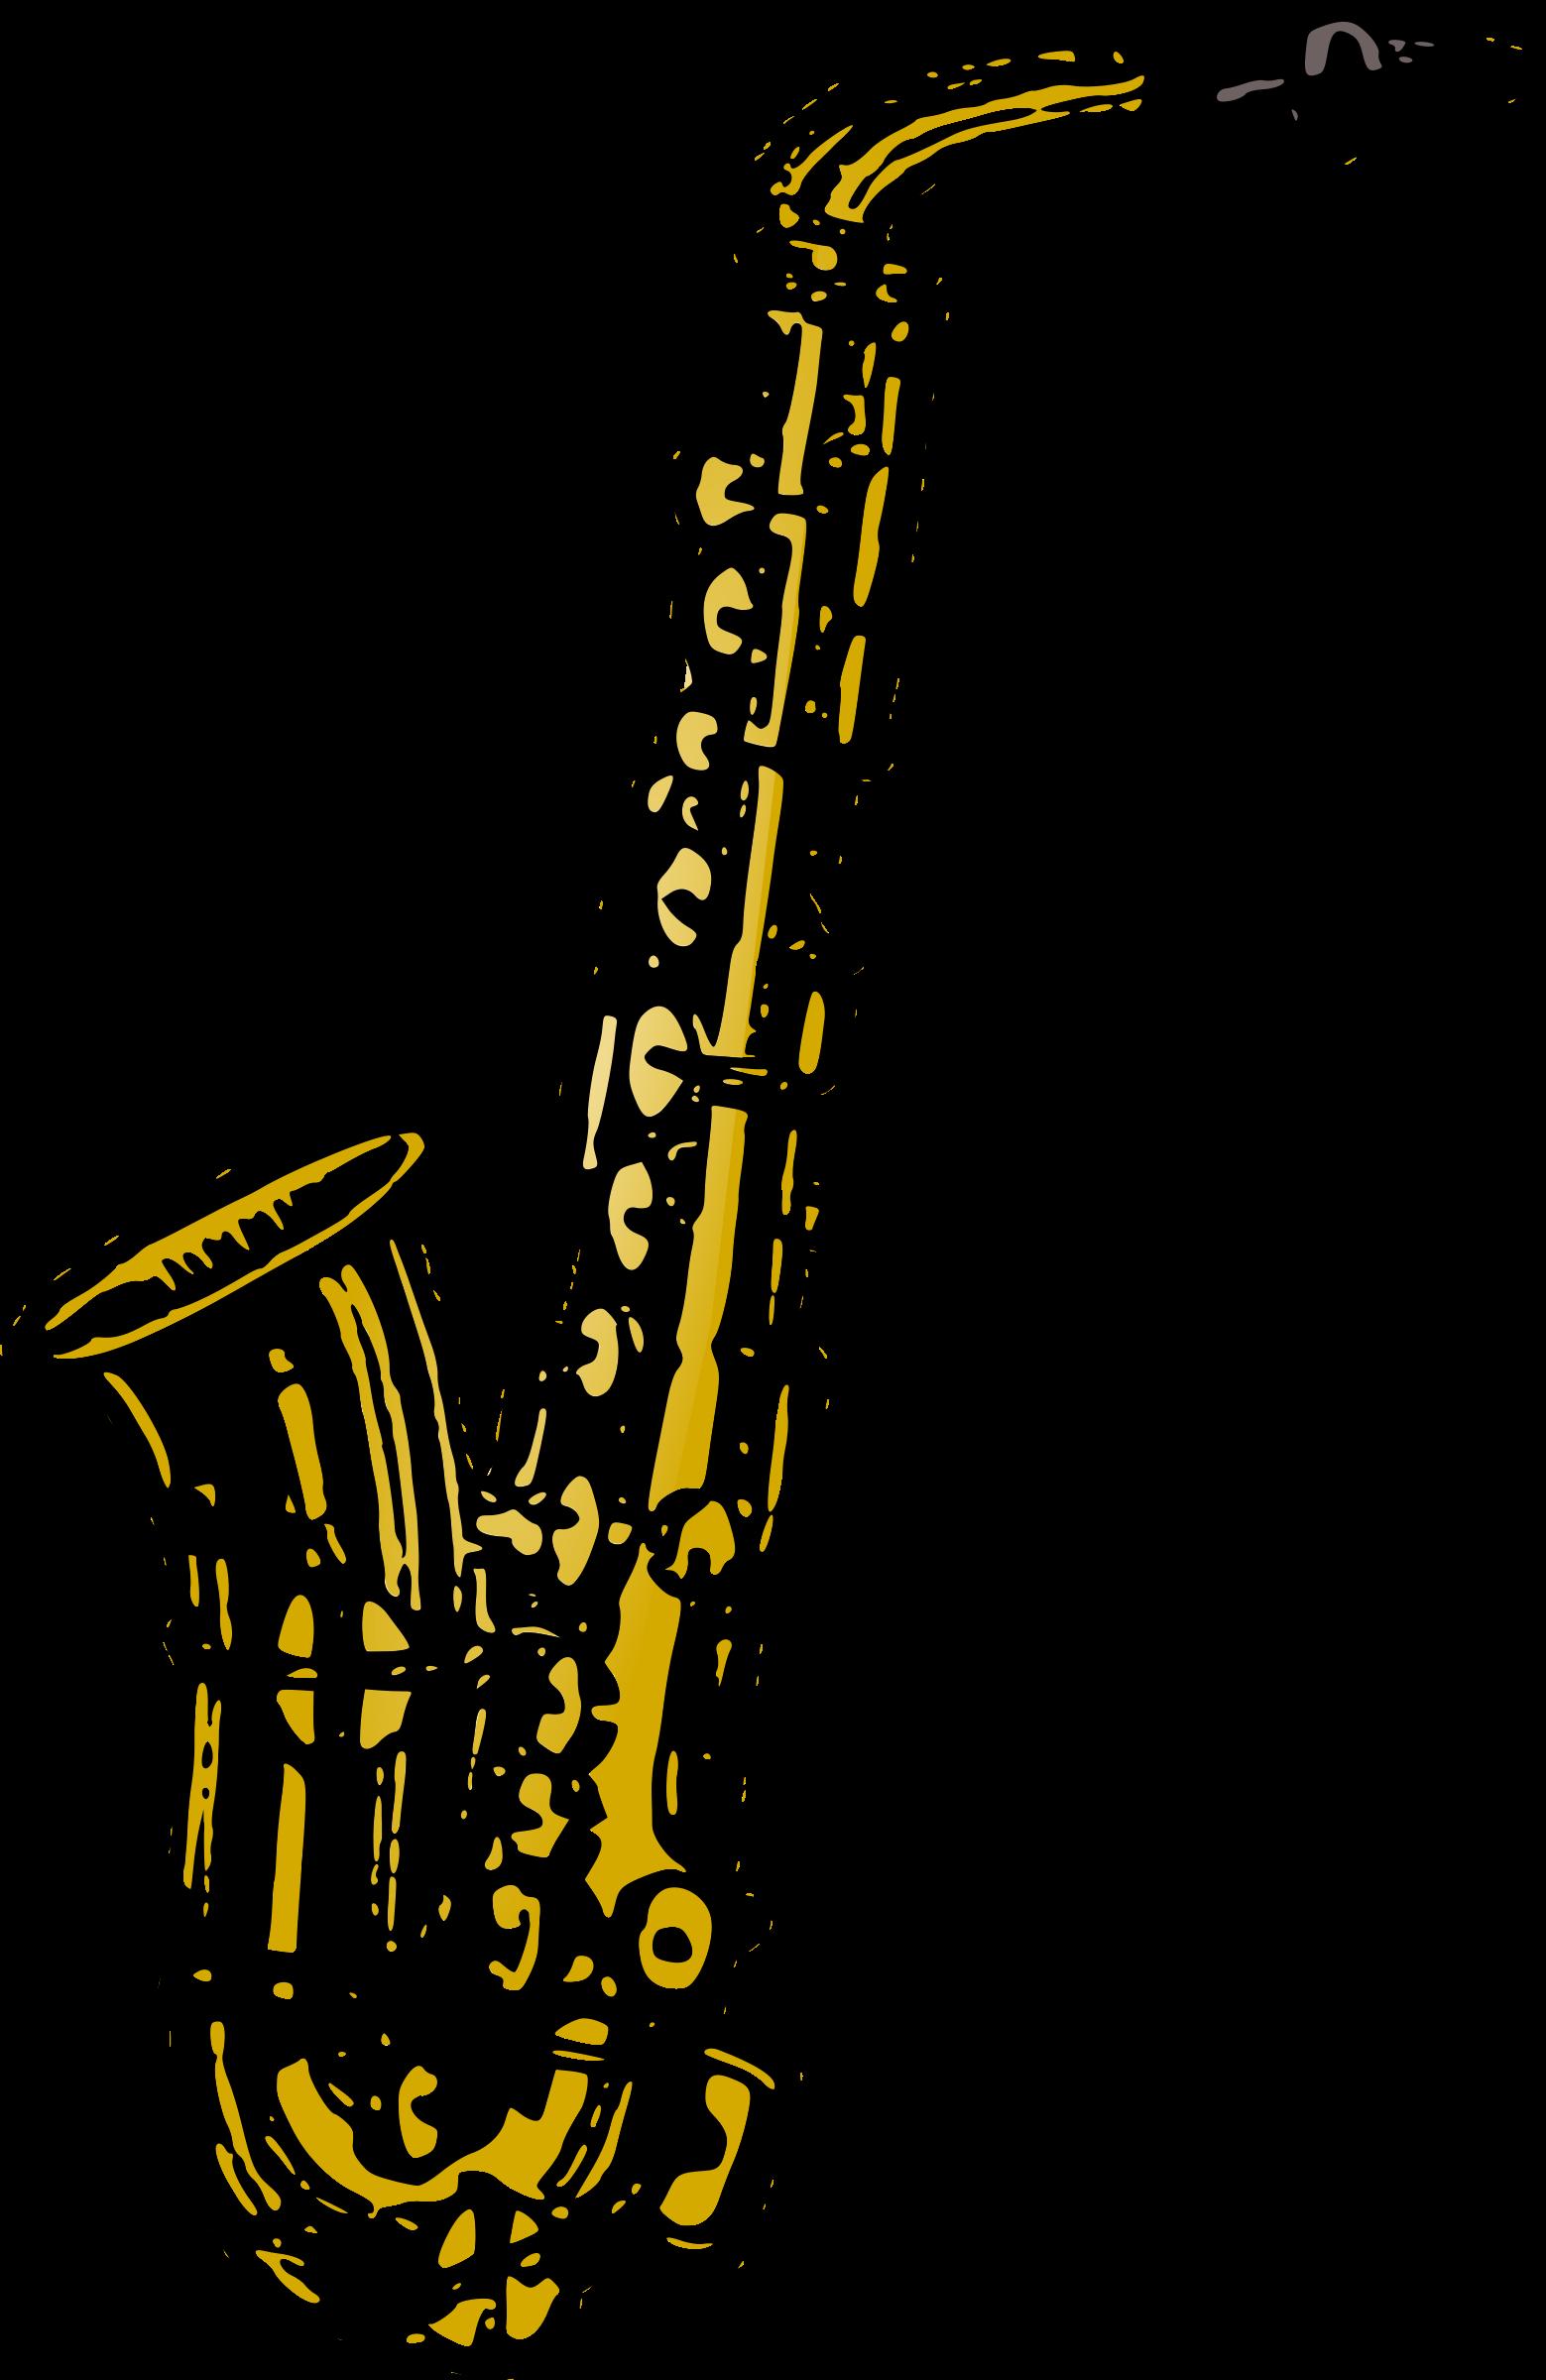 Download - Free PNG Saxophone